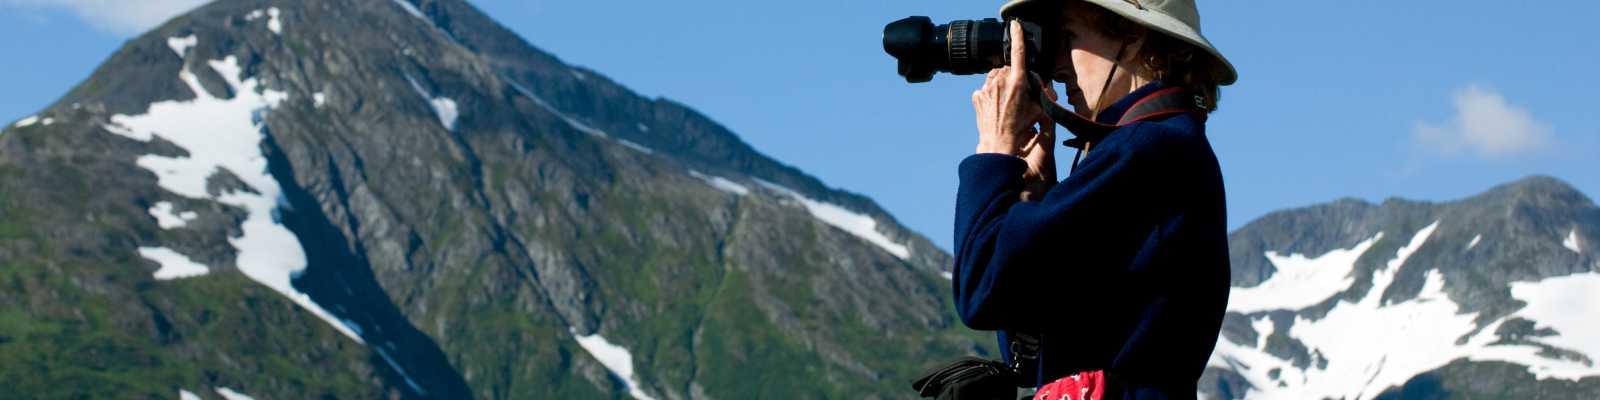 Alaska mountain photograph